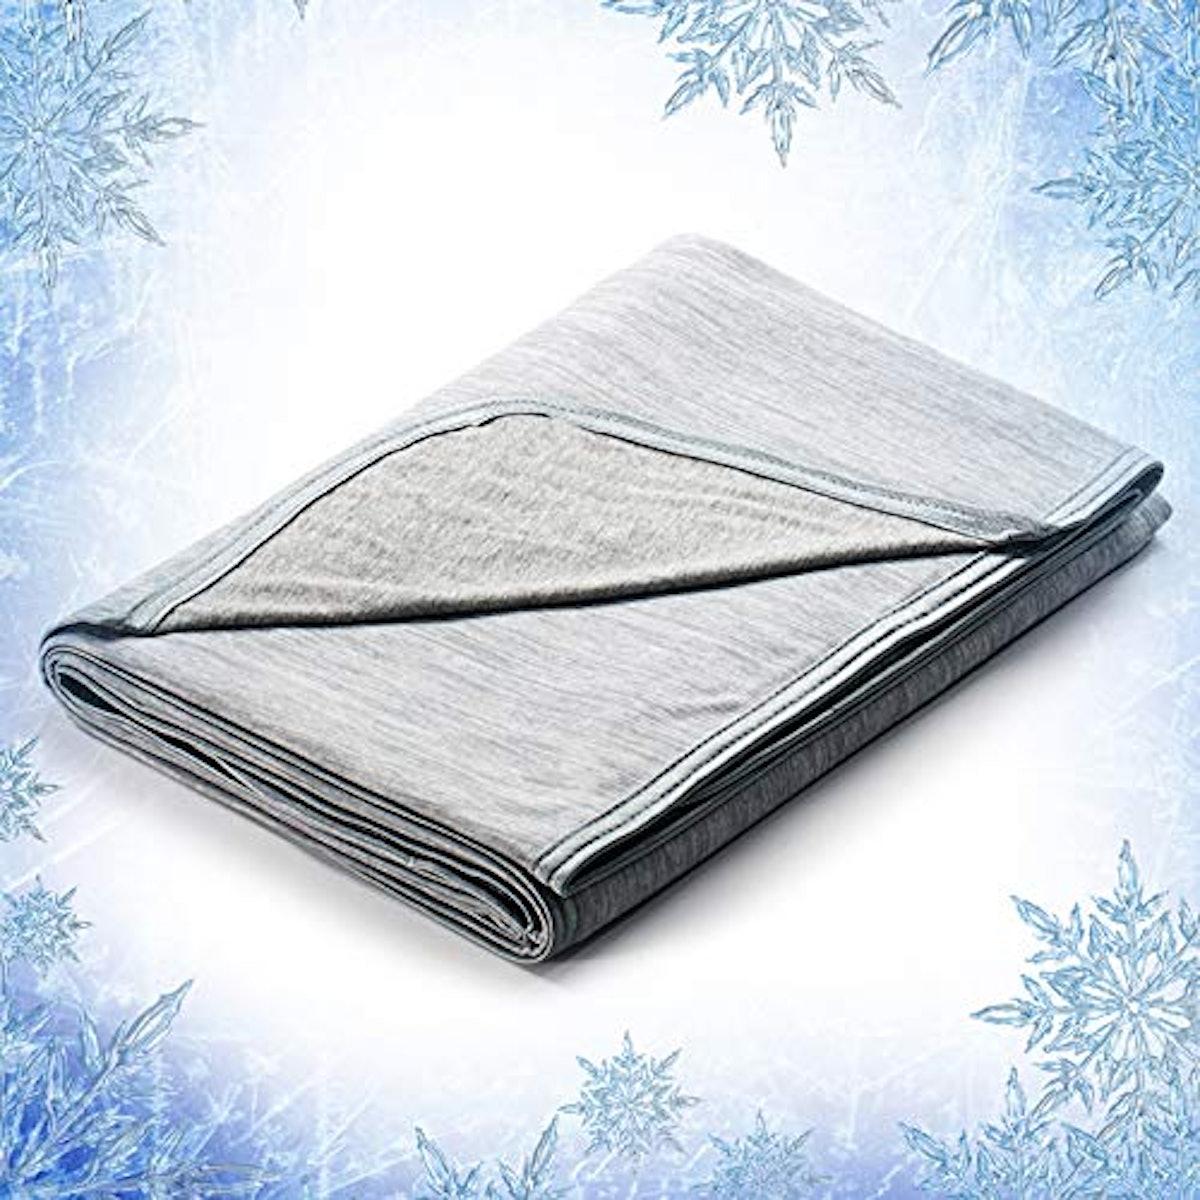 Elegear 51'' x 67'' Cooling Throw Blanket